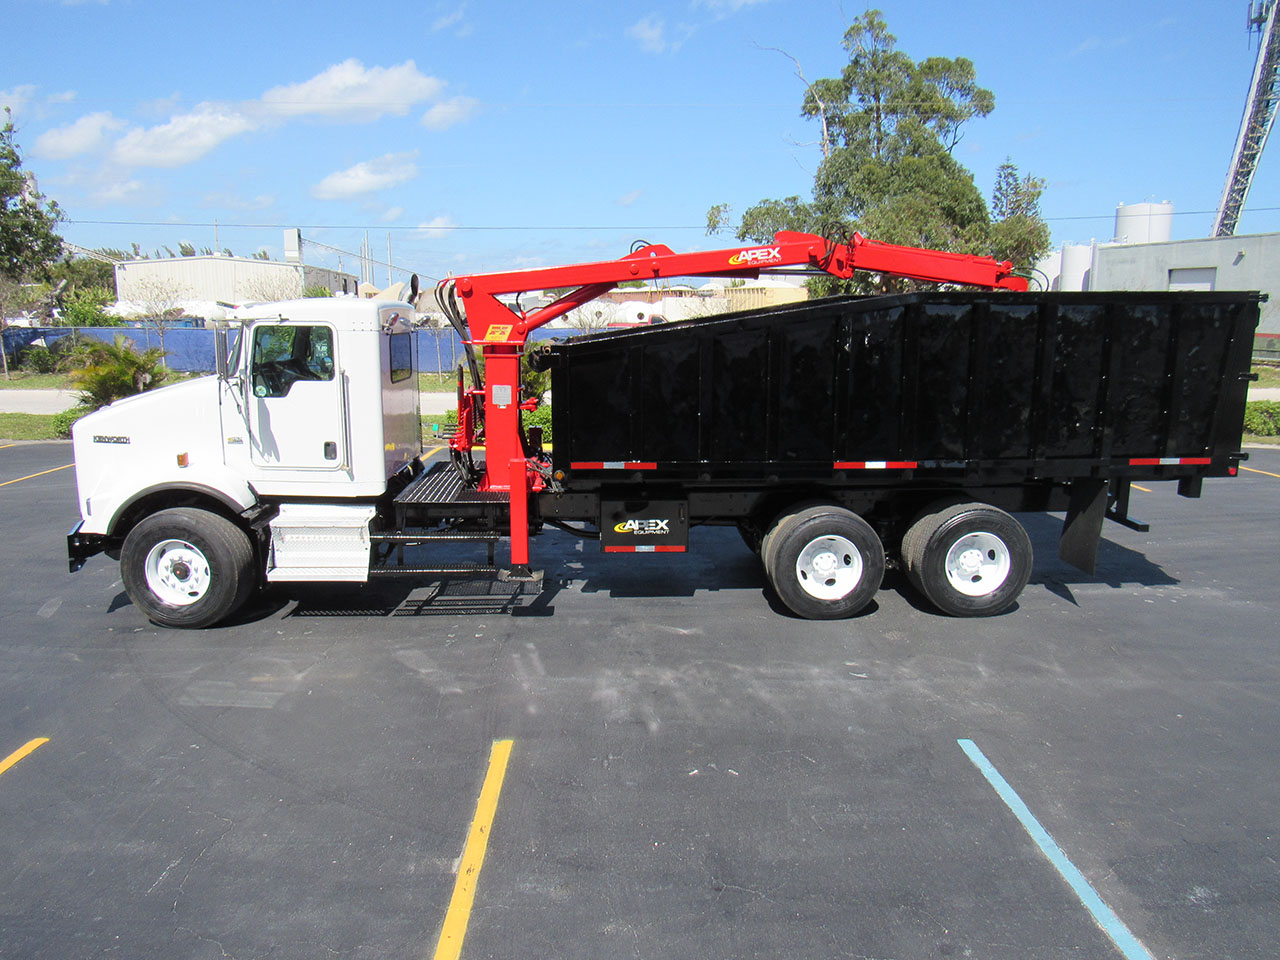 used 2008 Kenworth T800 in West Palm Beach, FL